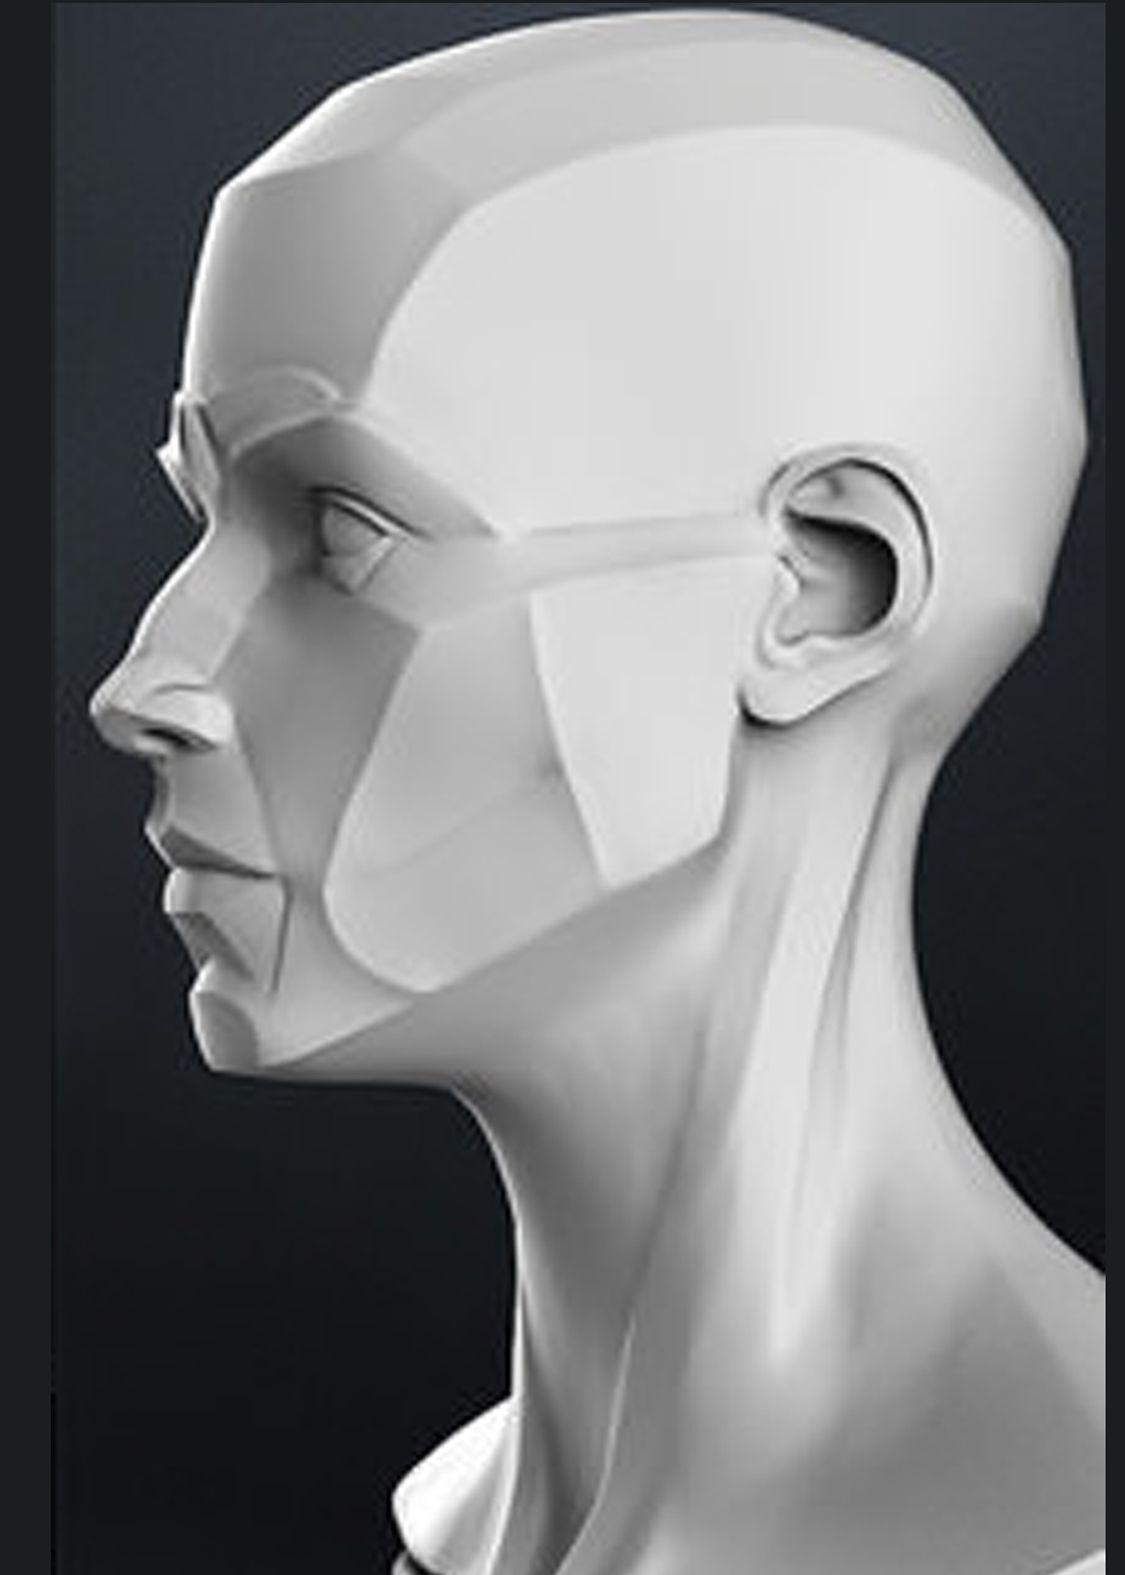 Pin de Cesar Gpe en Anatomía | Pinterest